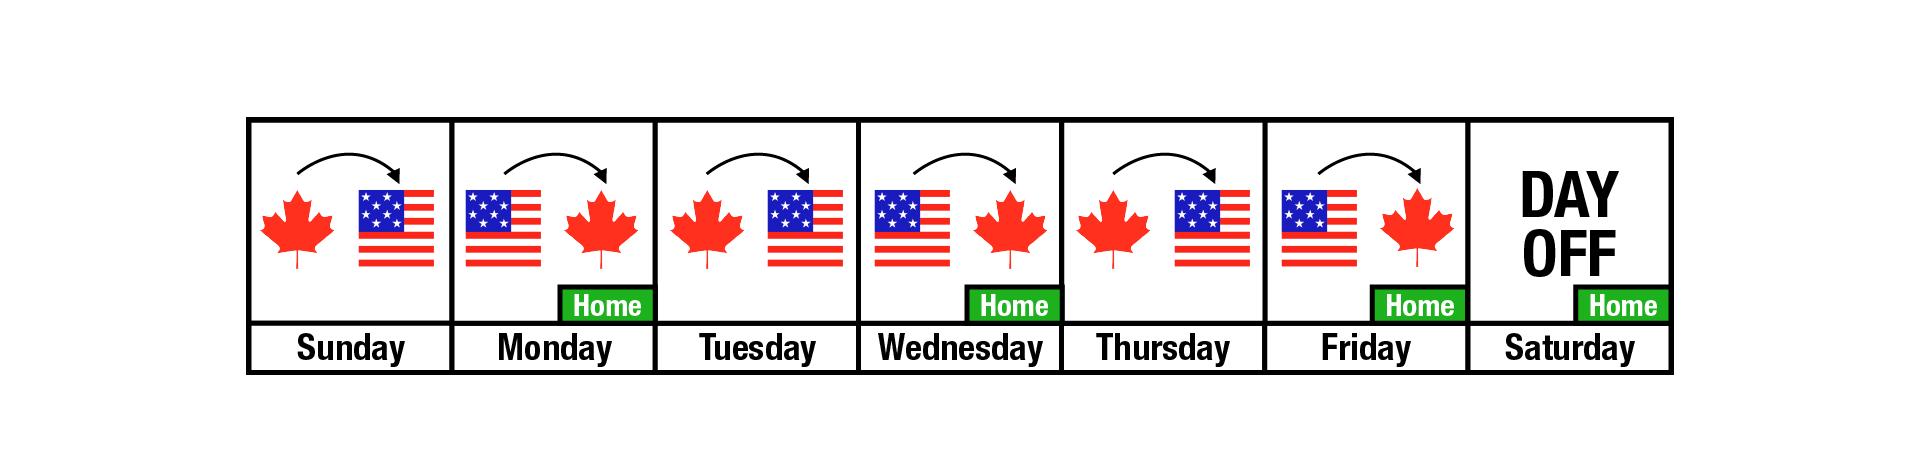 Tiny's Schedule